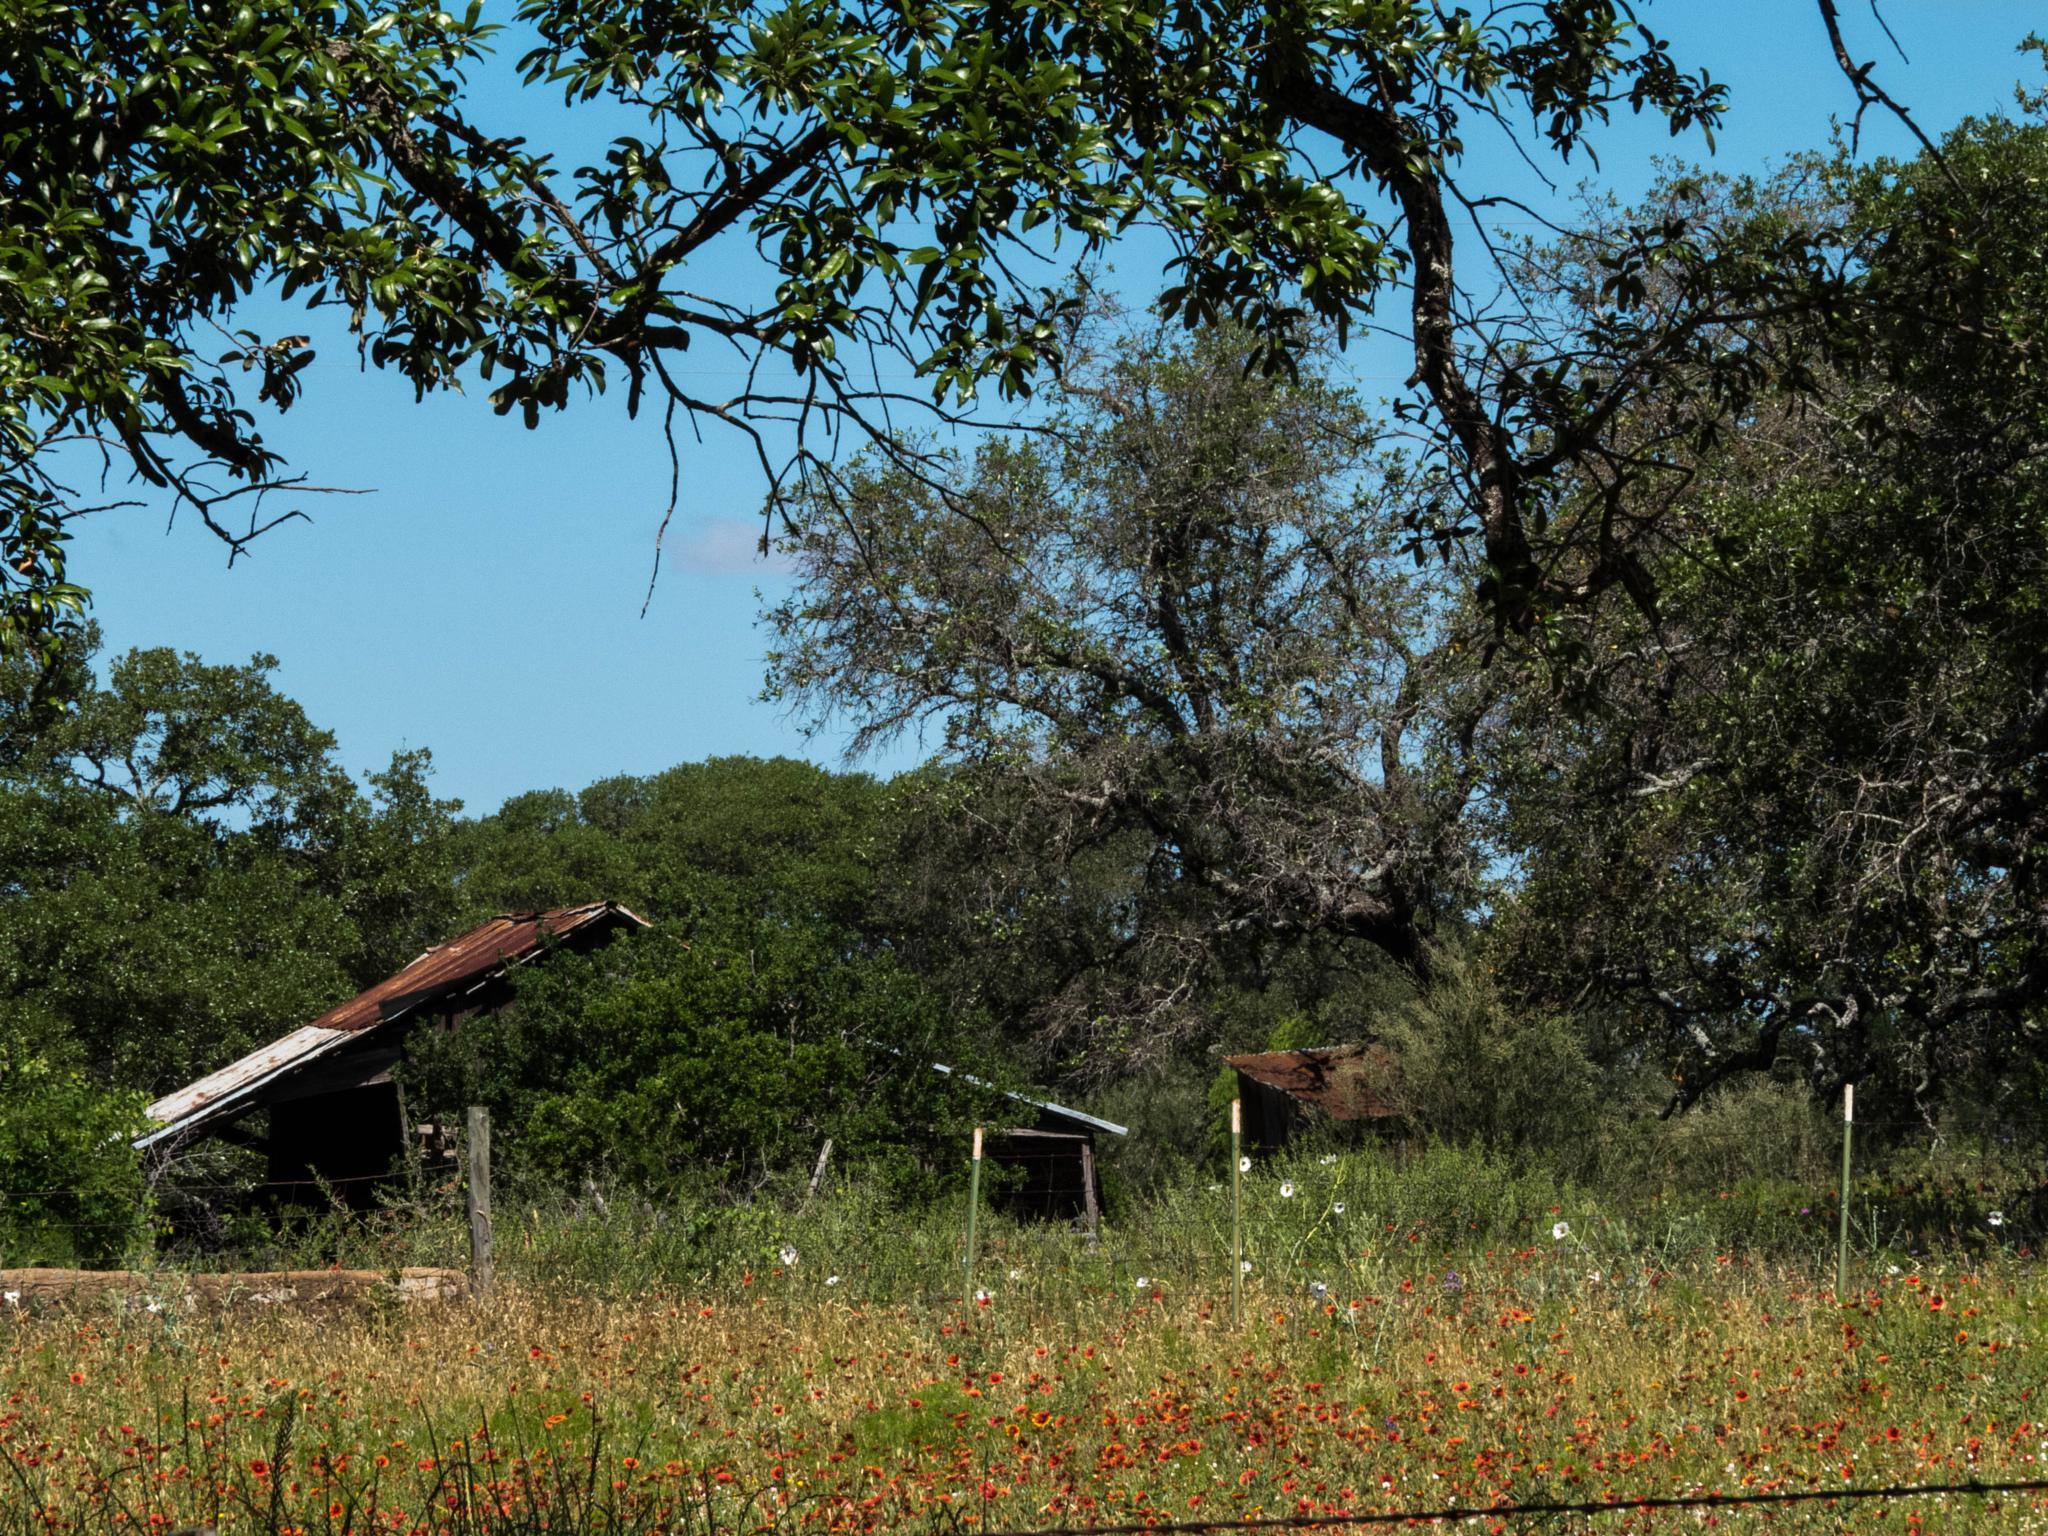 Abandoned Farm House by Jill Rapley